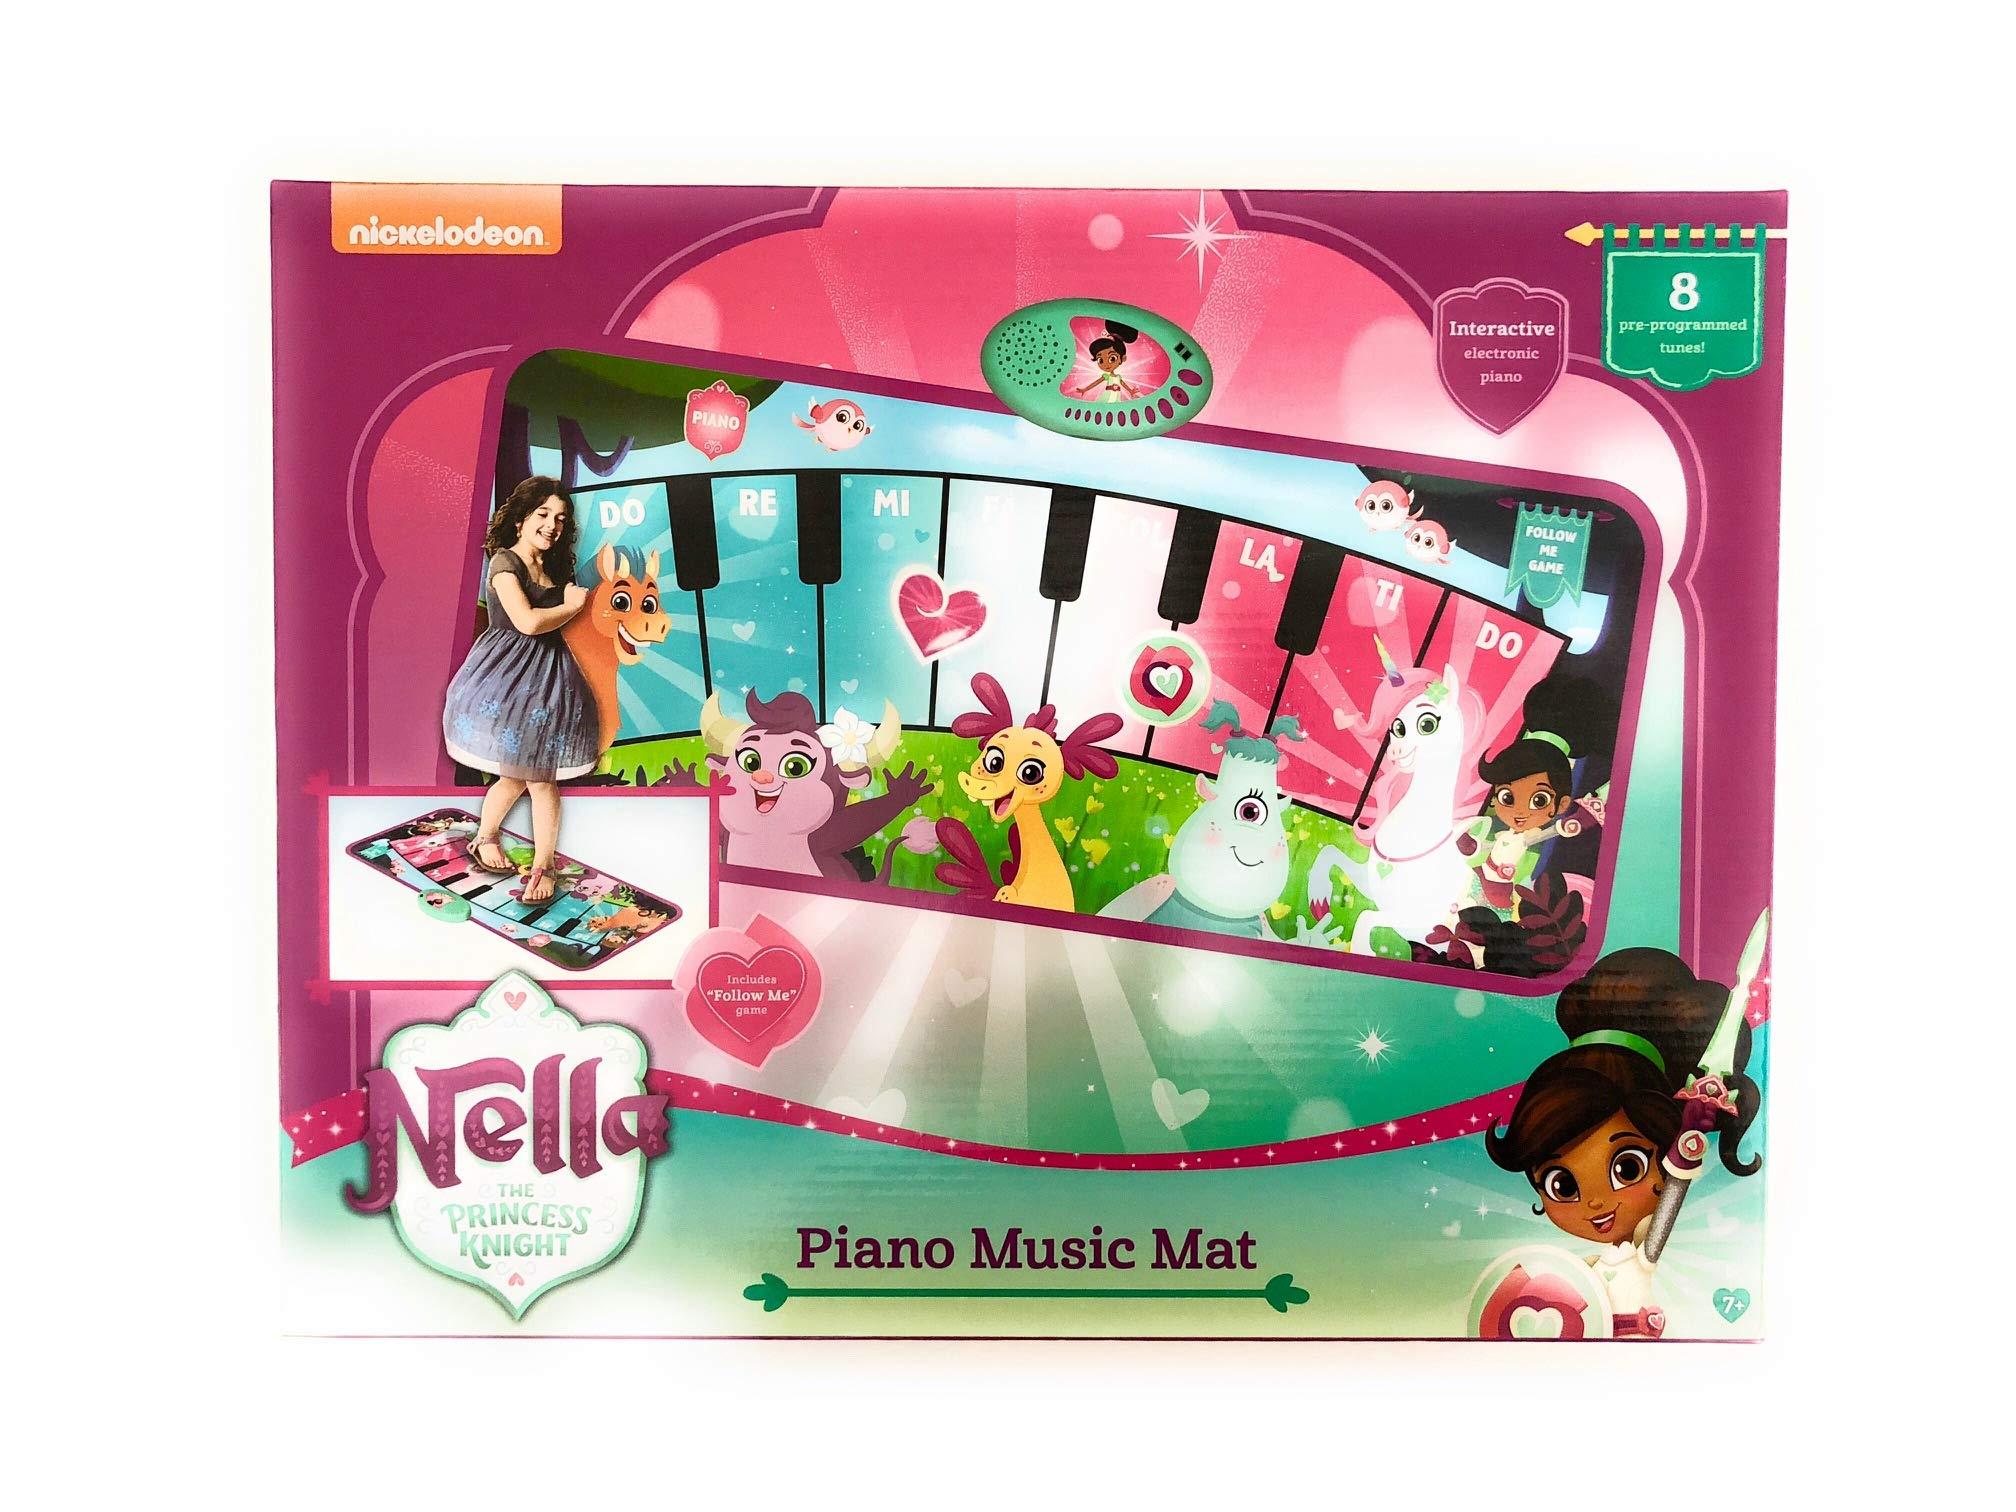 Nickelodeon Nella The Princess Knight Piano Dance Mat by Nickelodeon (Image #1)